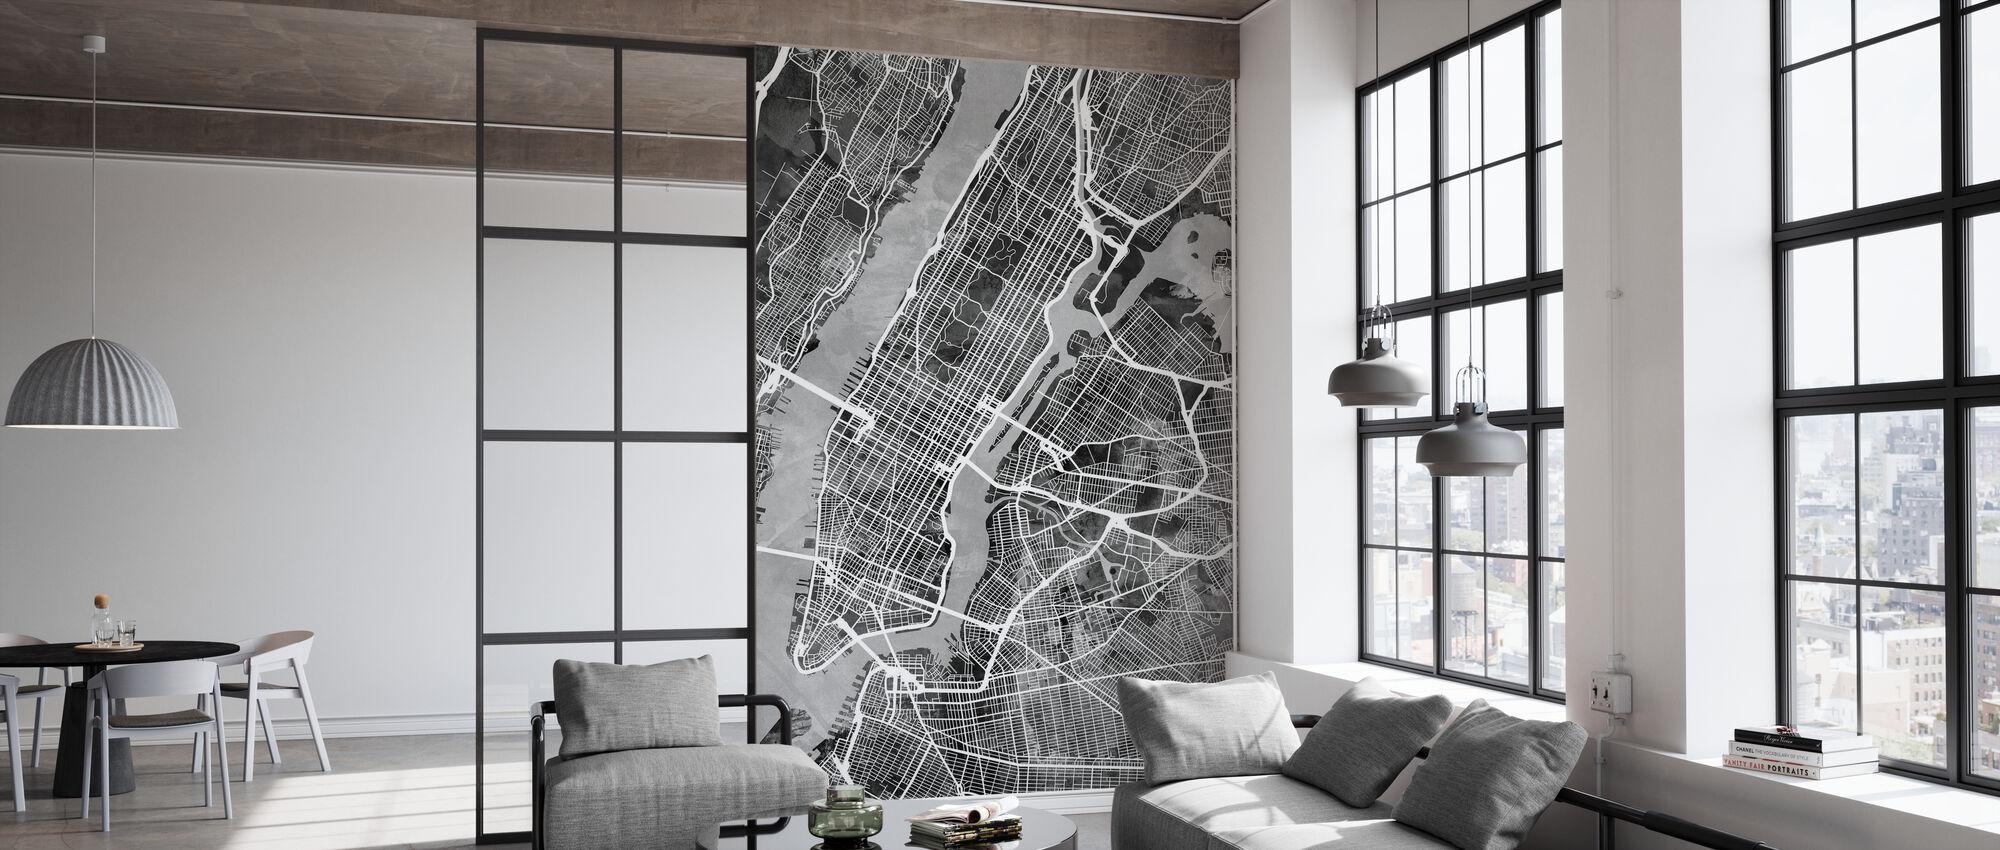 New York Street Map B/W - Wallpaper - Office